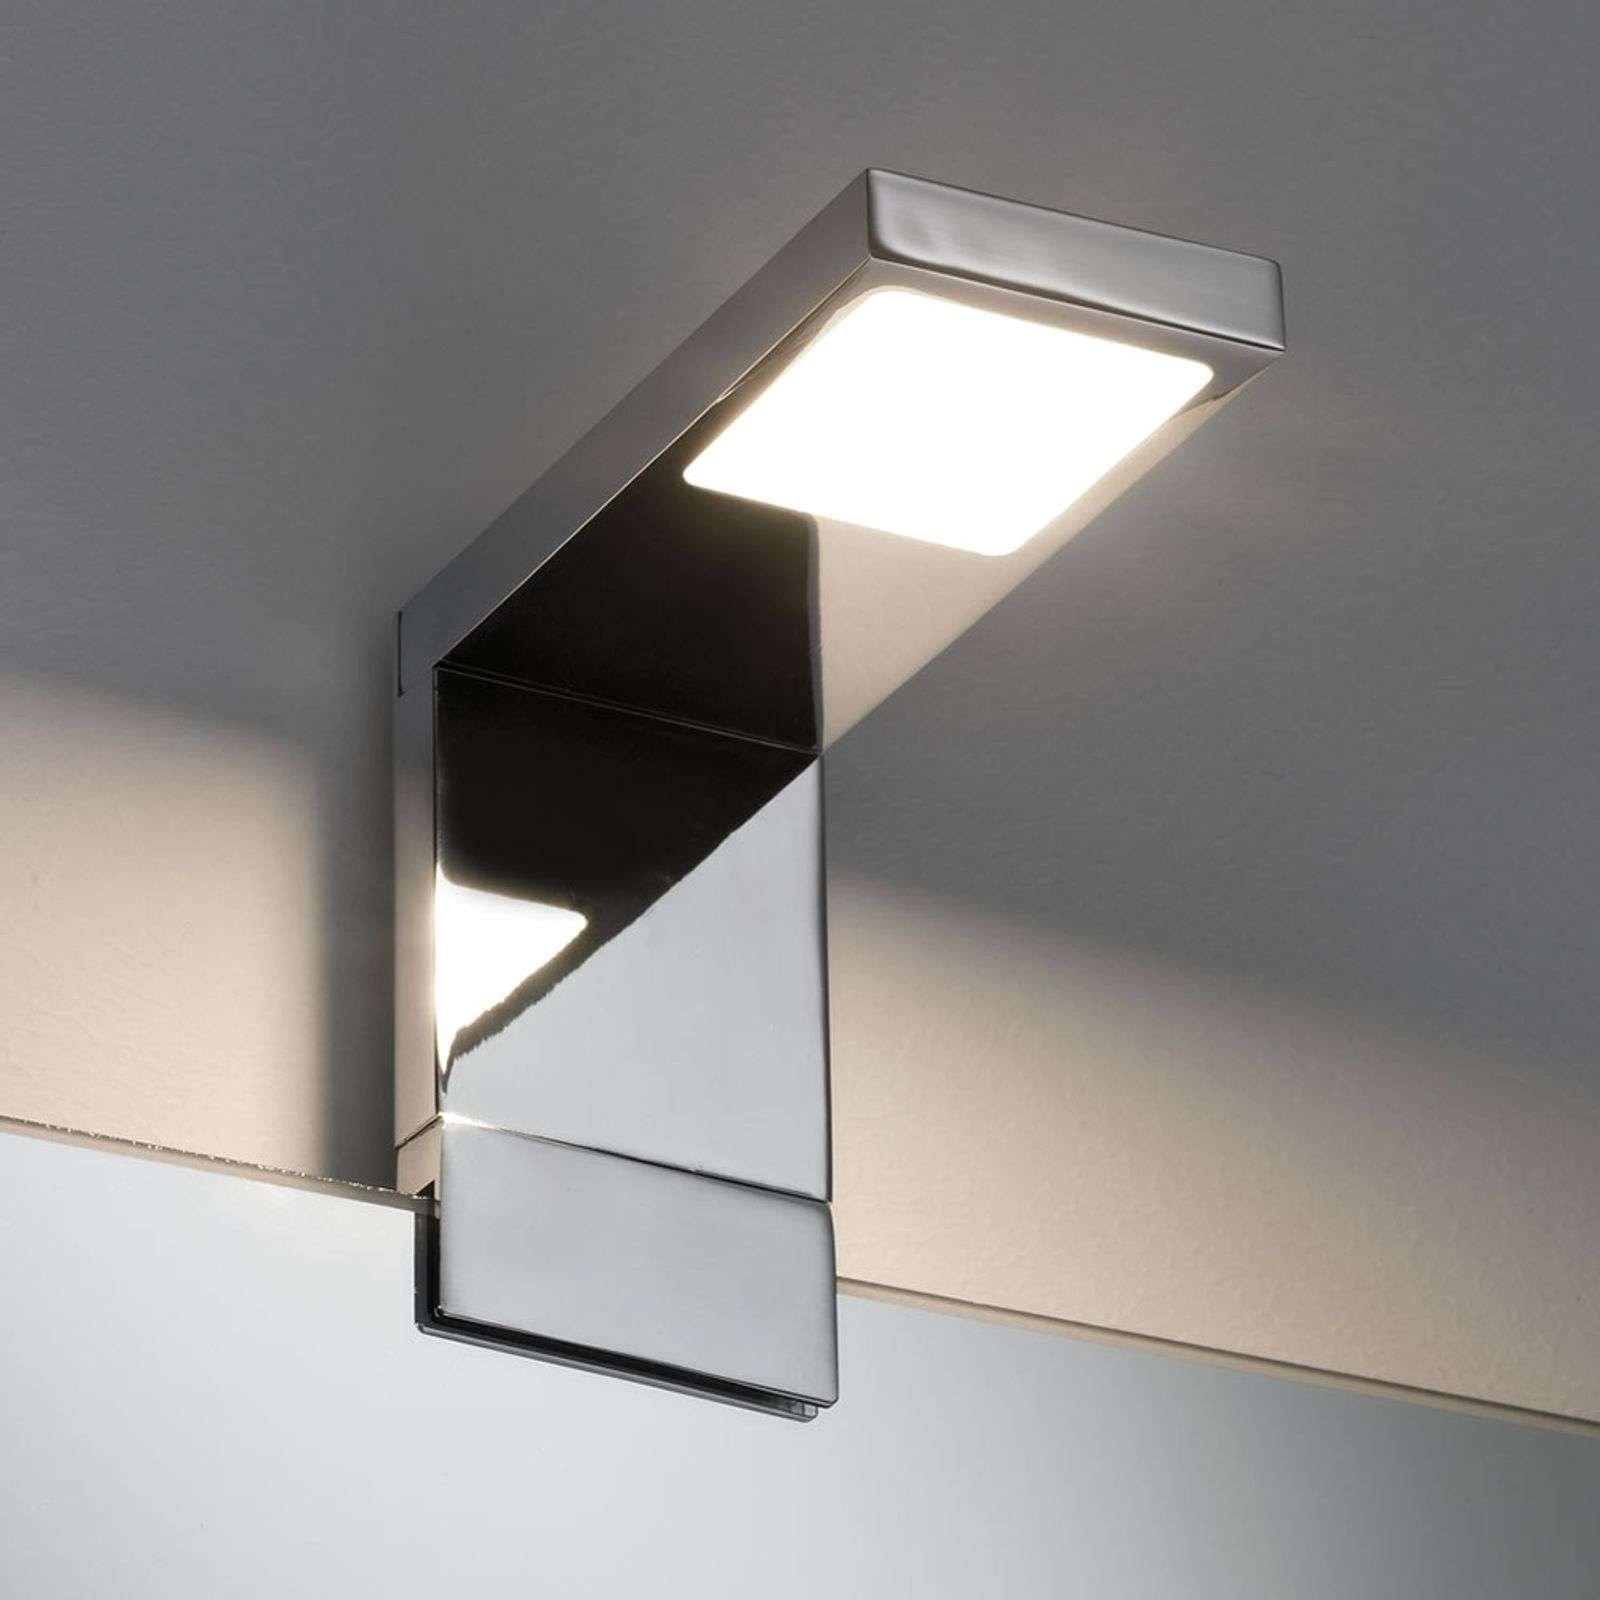 Paulmann Galeria Frame mirror lamp  angular